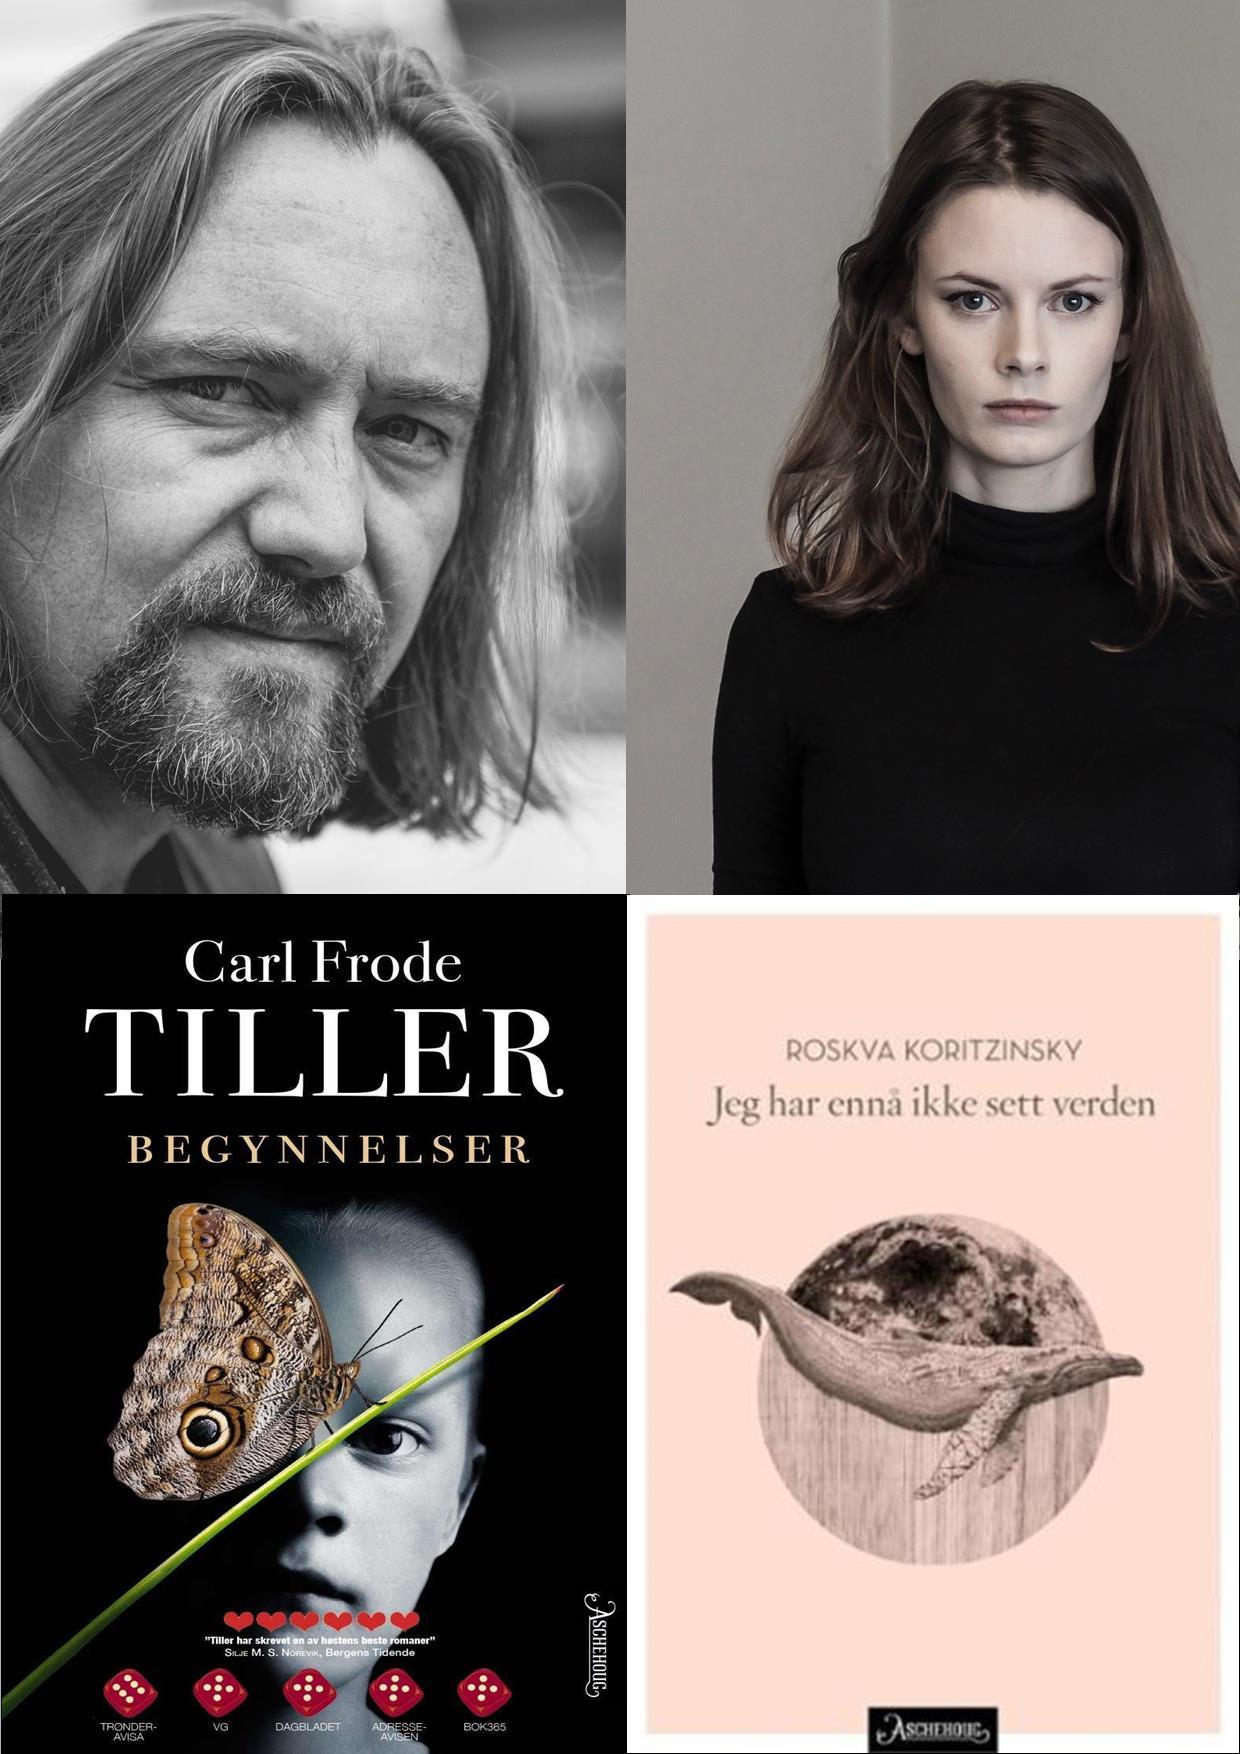 Nordisk råds litteraturpris 2018